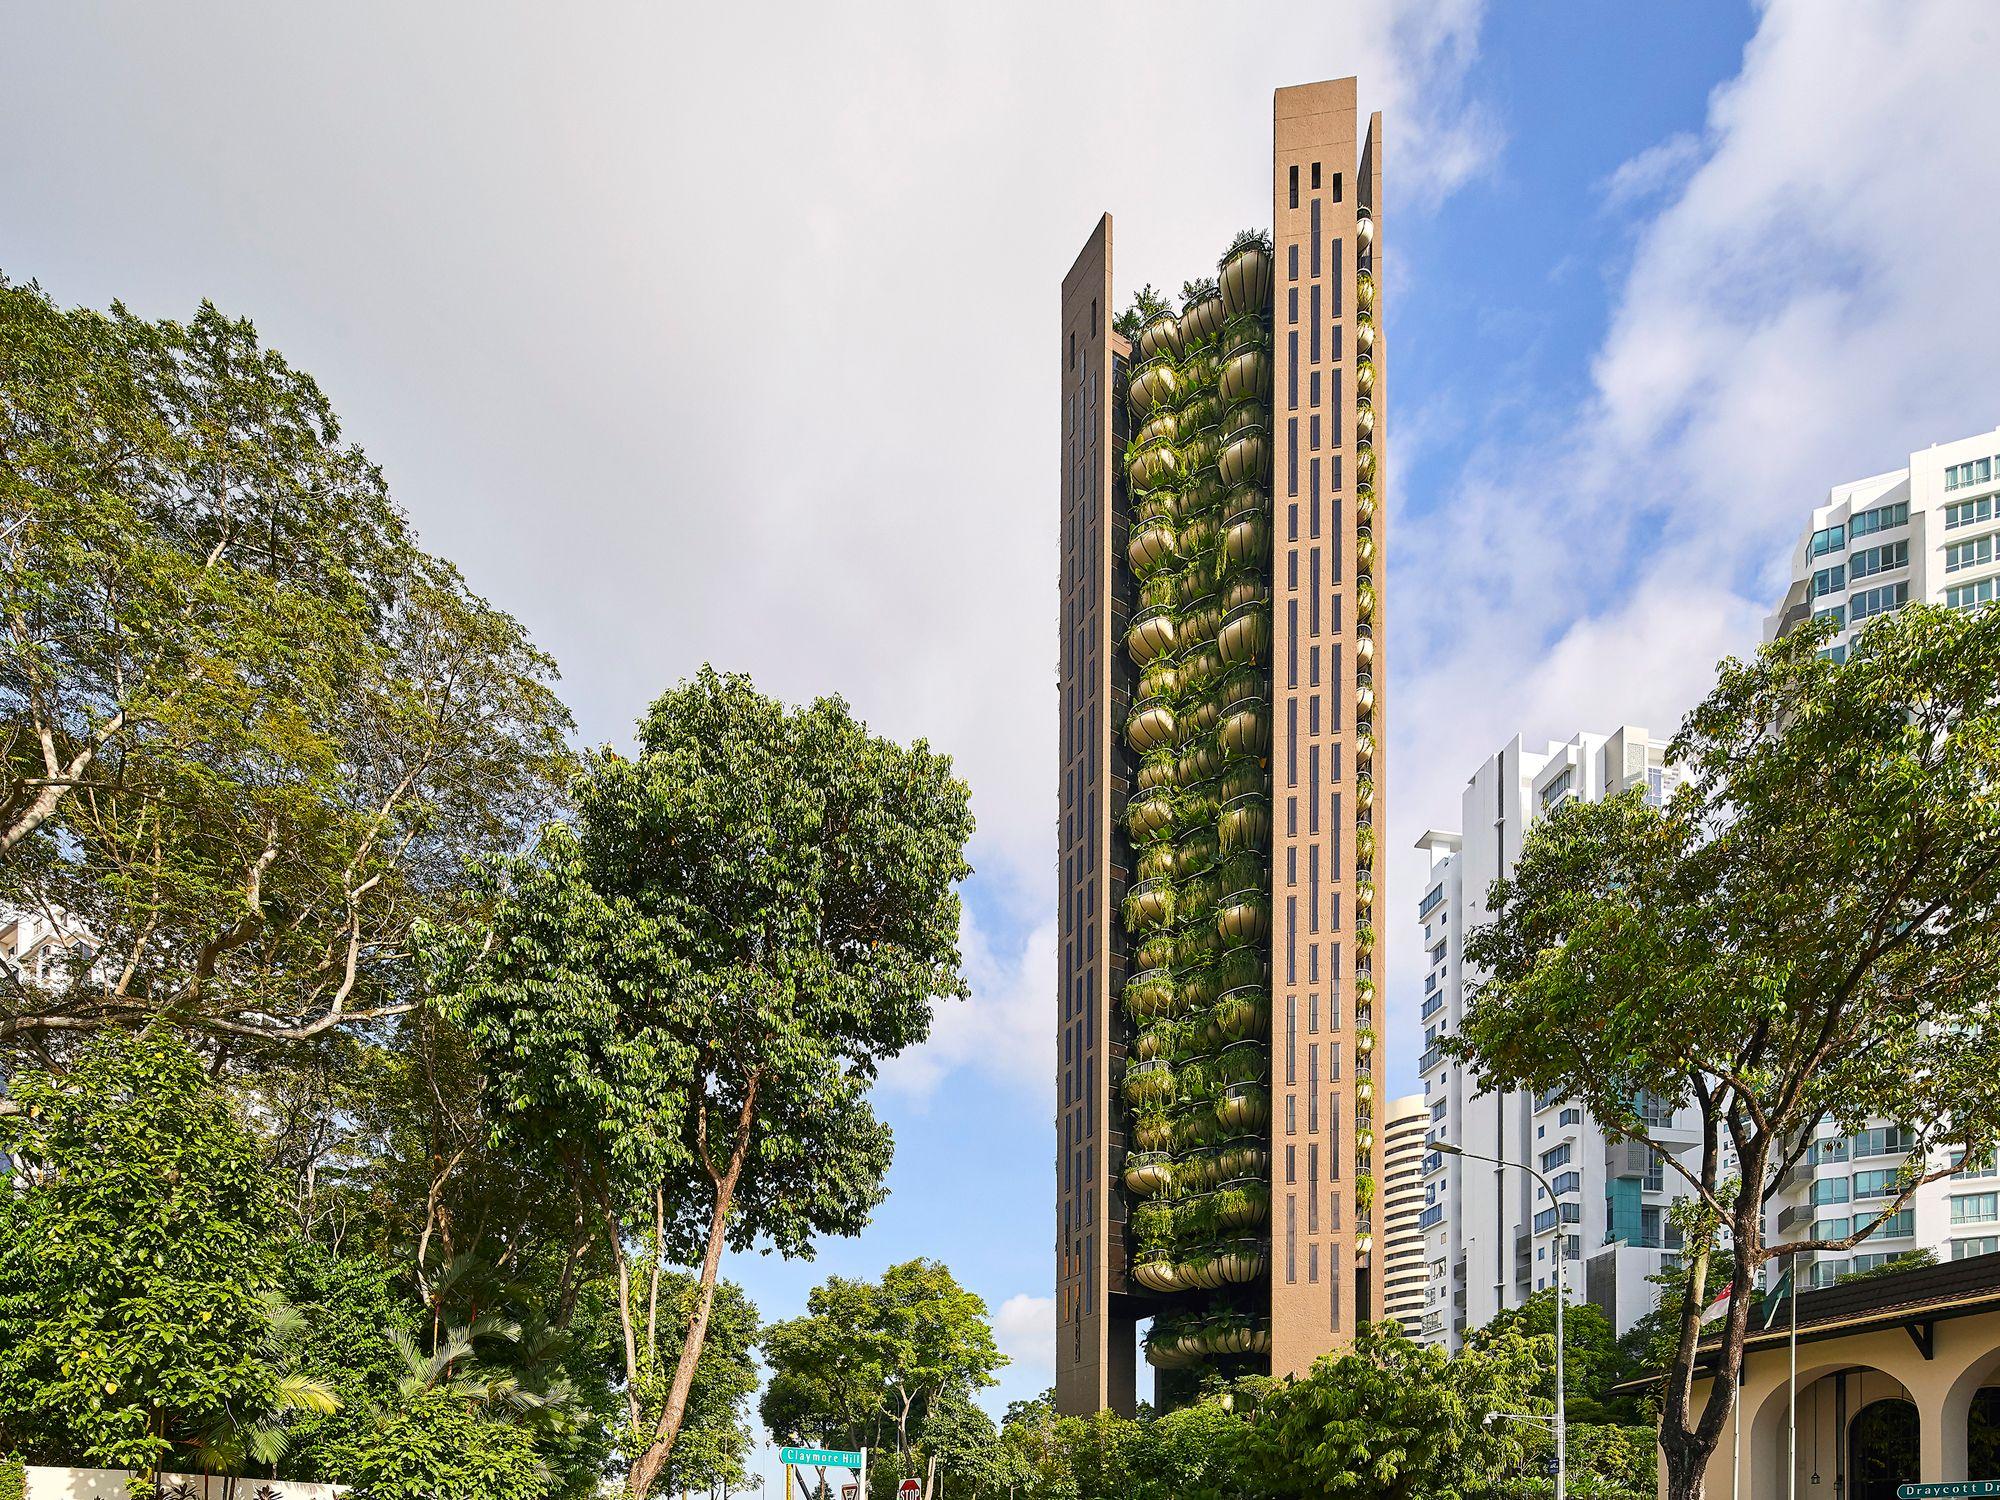 Swire Properties Eden, designed by Thomas Heatherwick